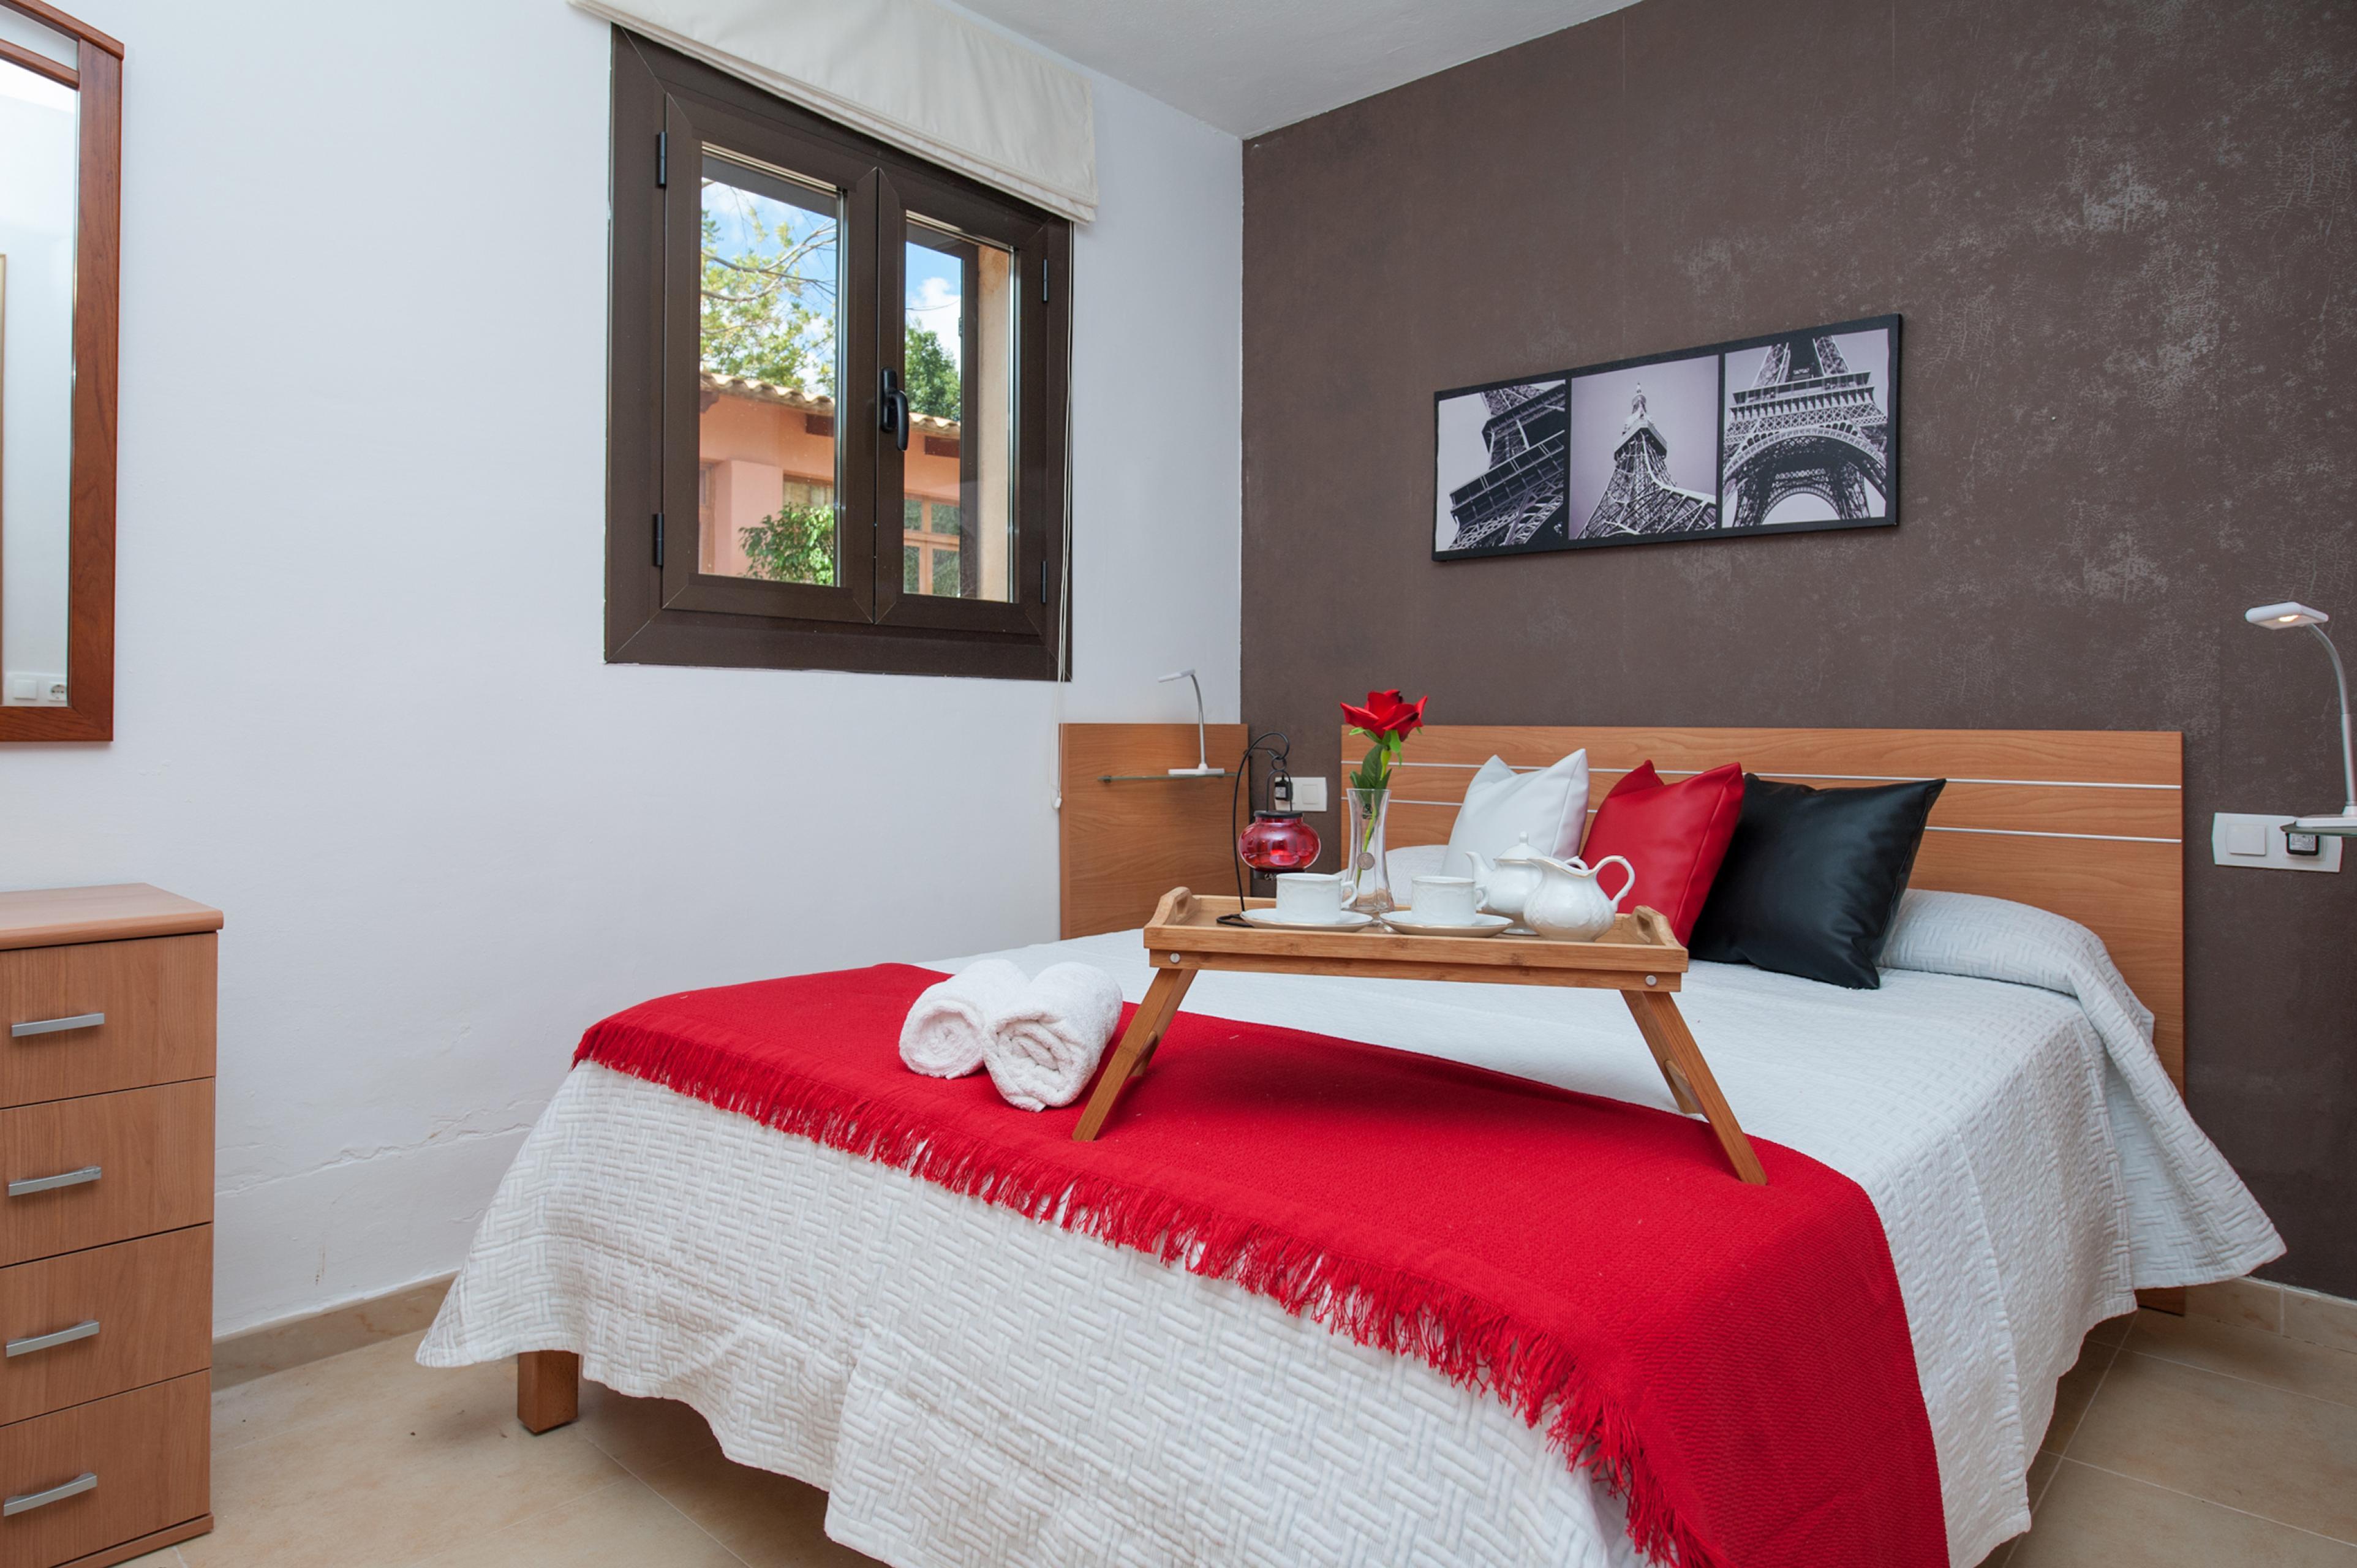 Maison de vacances CA'N LLUC- Alaró- MALLORCA - Kostenloses WLAN (2687507), Alaro, Majorque, Iles Baléares, Espagne, image 29